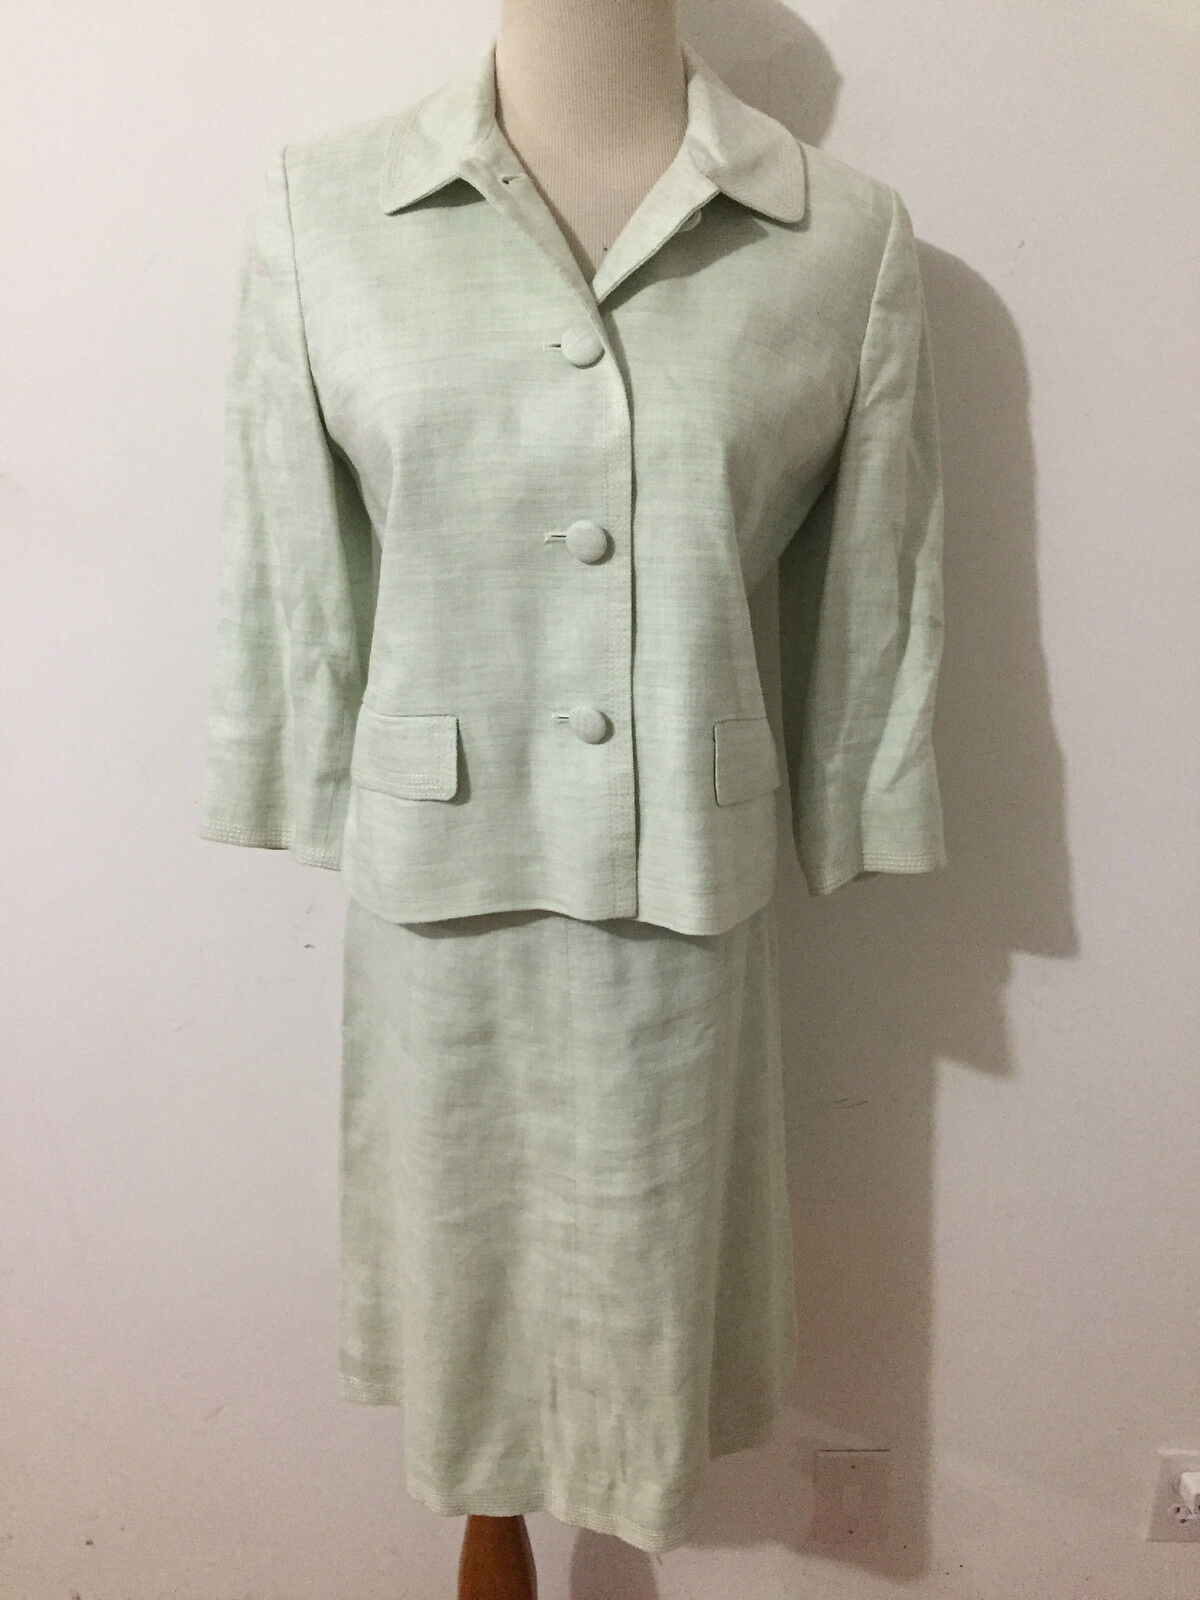 Ann Taylor LOFT Petites Skirt Suit Sea Foam Linen Blend Size 4P Blazer 2P Skirt